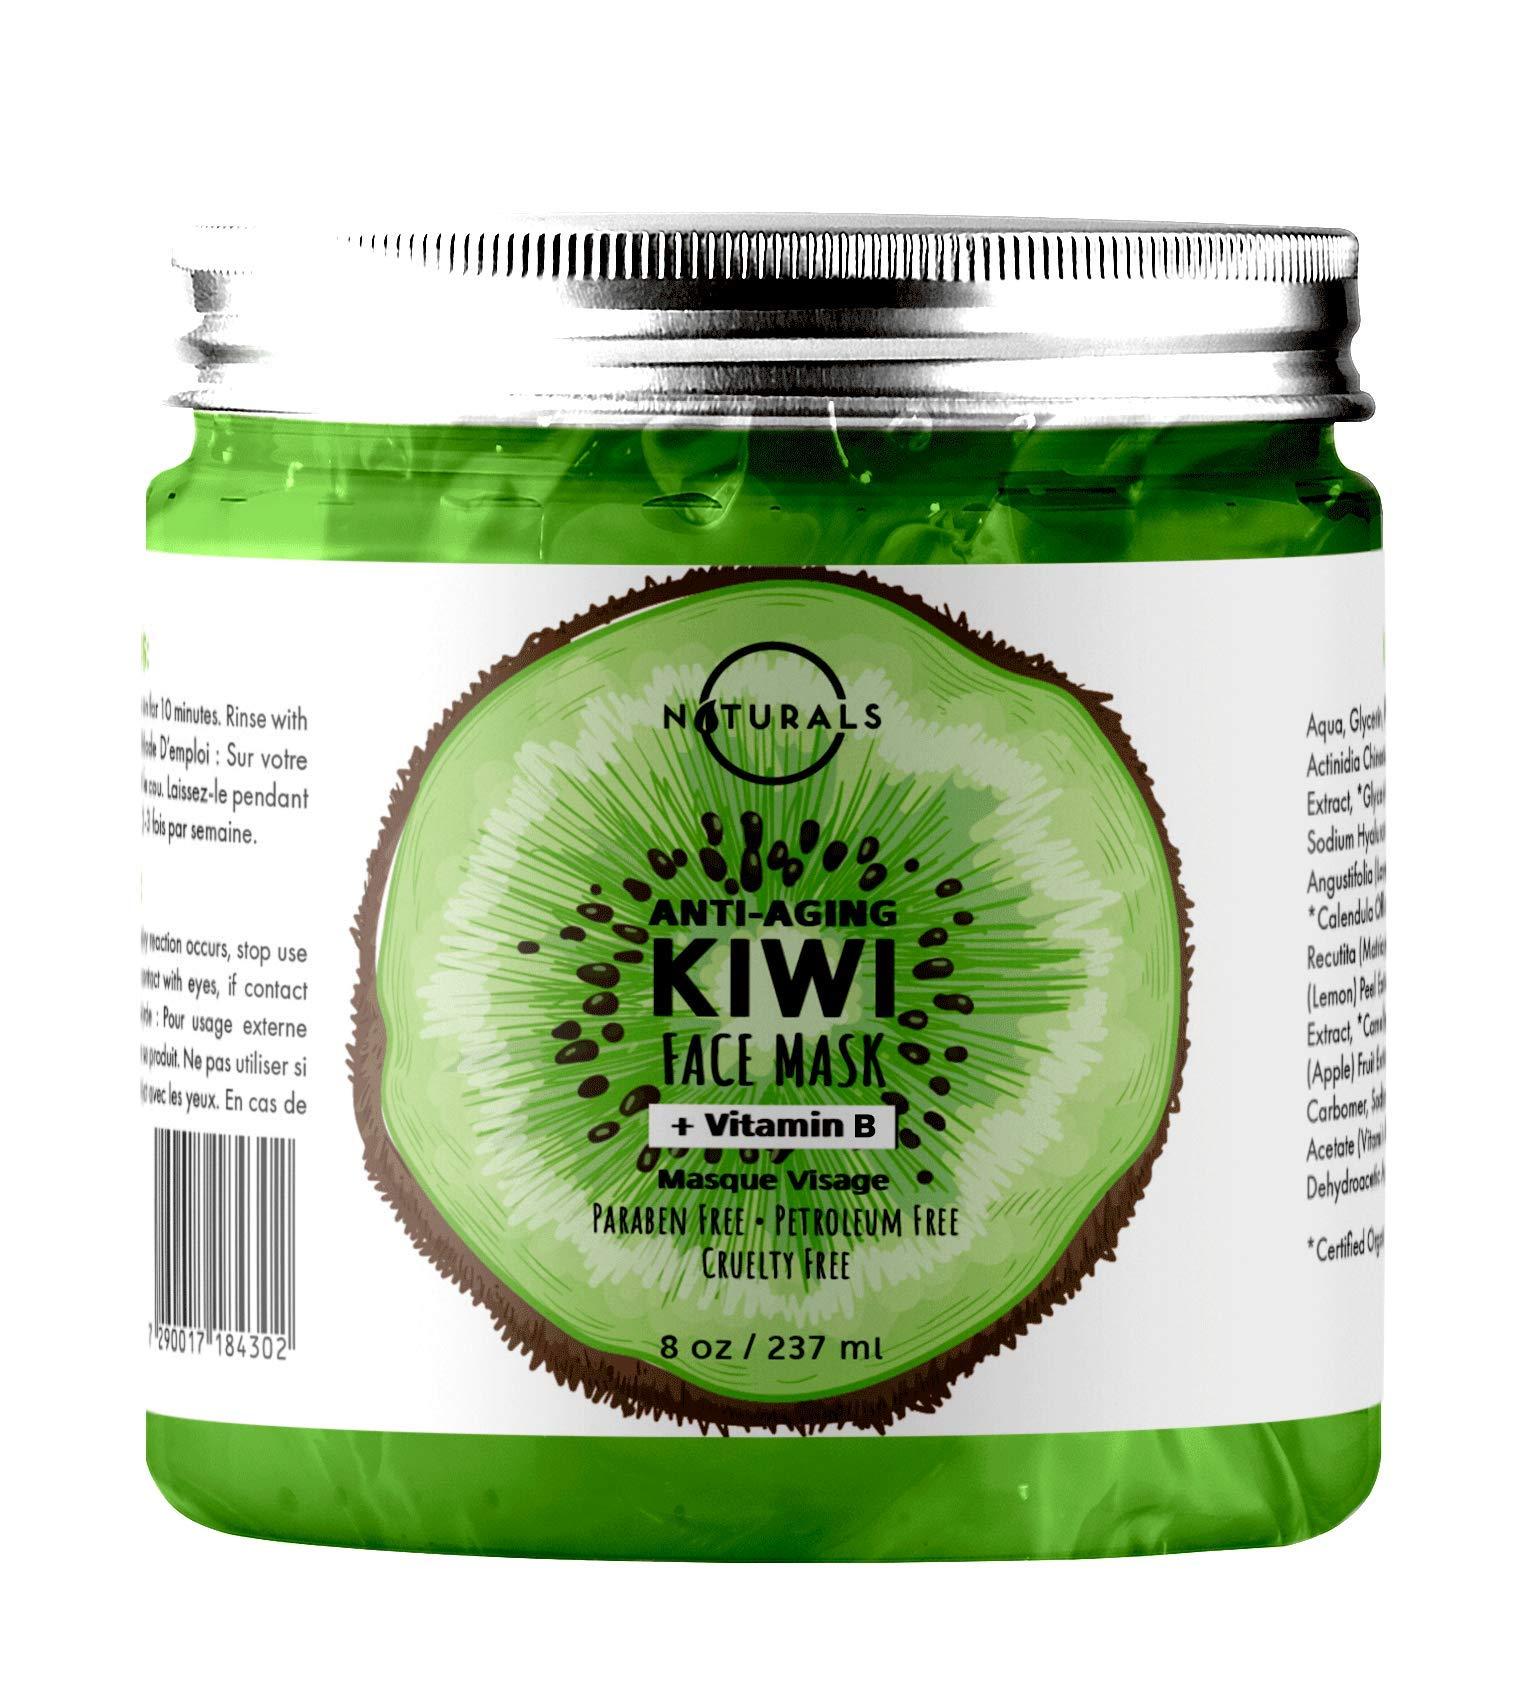 O Naturals Hydrating Kiwi & Cucumber Vitamin E Anti-Aging Gel Face Mask. Firms Skin. Reduces, Redness Sun Damage Wrinkles Scars Boosts Collagen & Moisturizes. Hyaluronic Acid Apple Spirulina Vegan 8oz